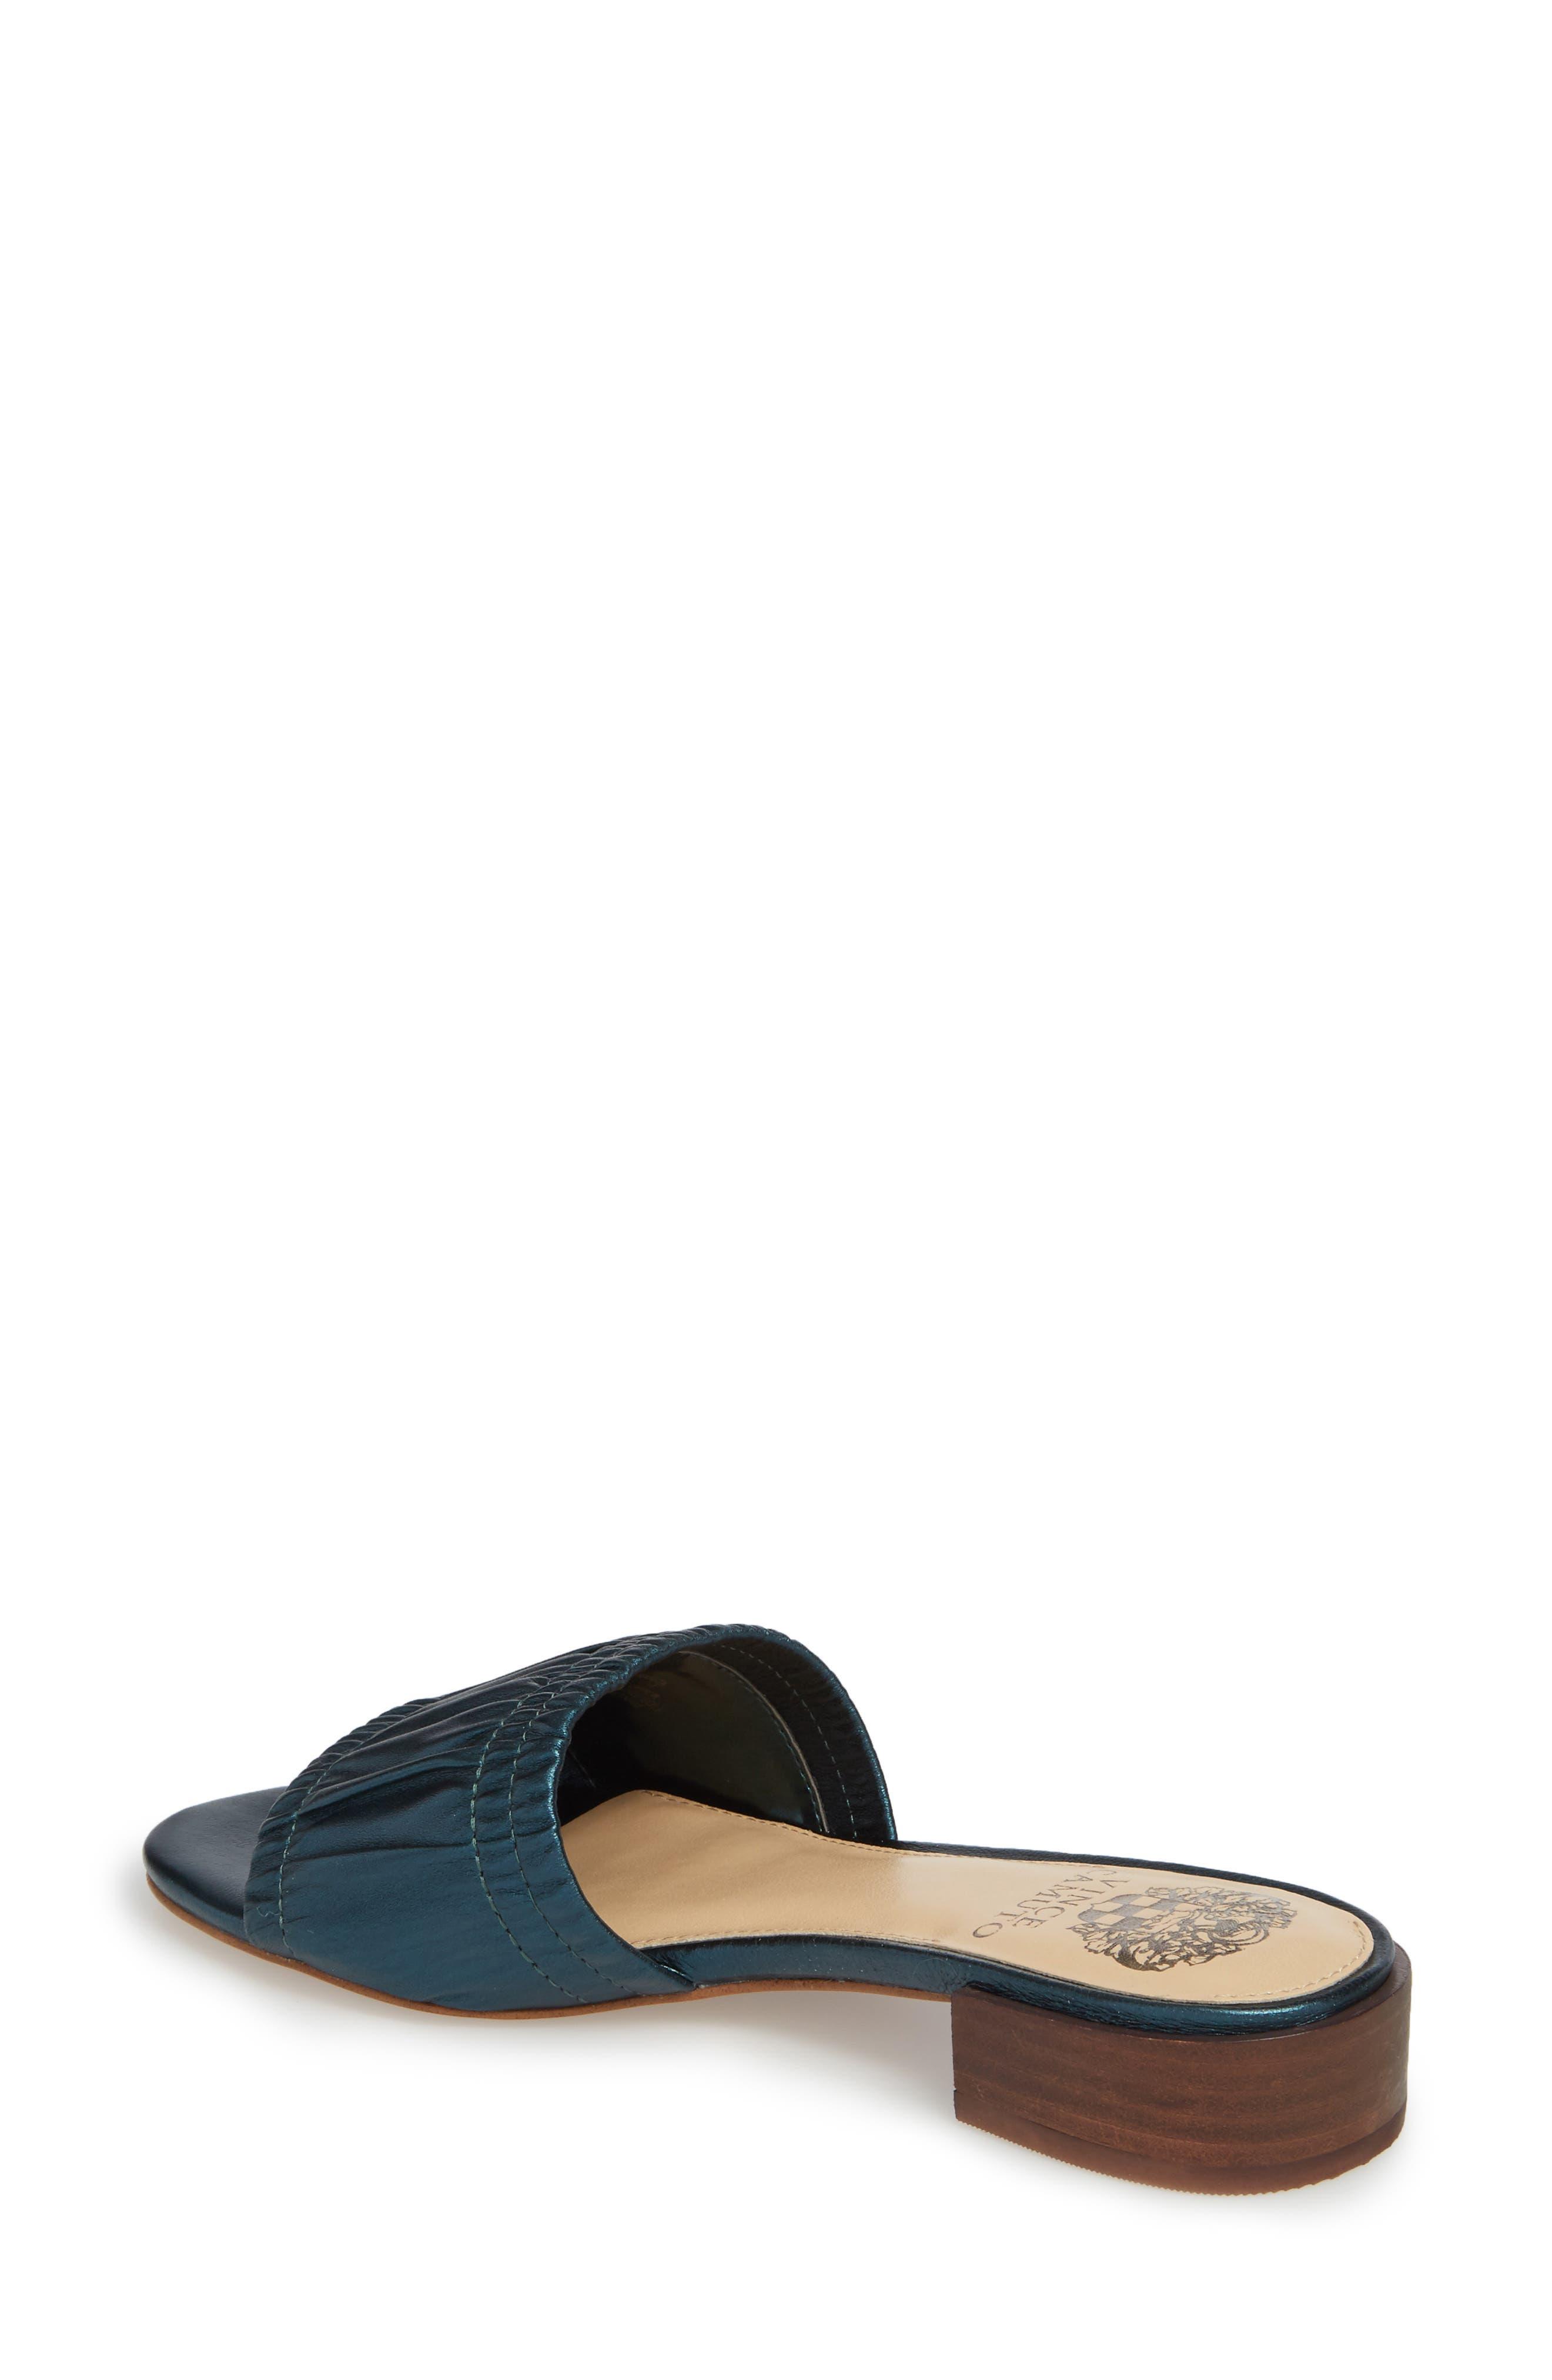 Nanita Pleated Slide Sandal,                             Alternate thumbnail 2, color,                             Metal Teal Fabric